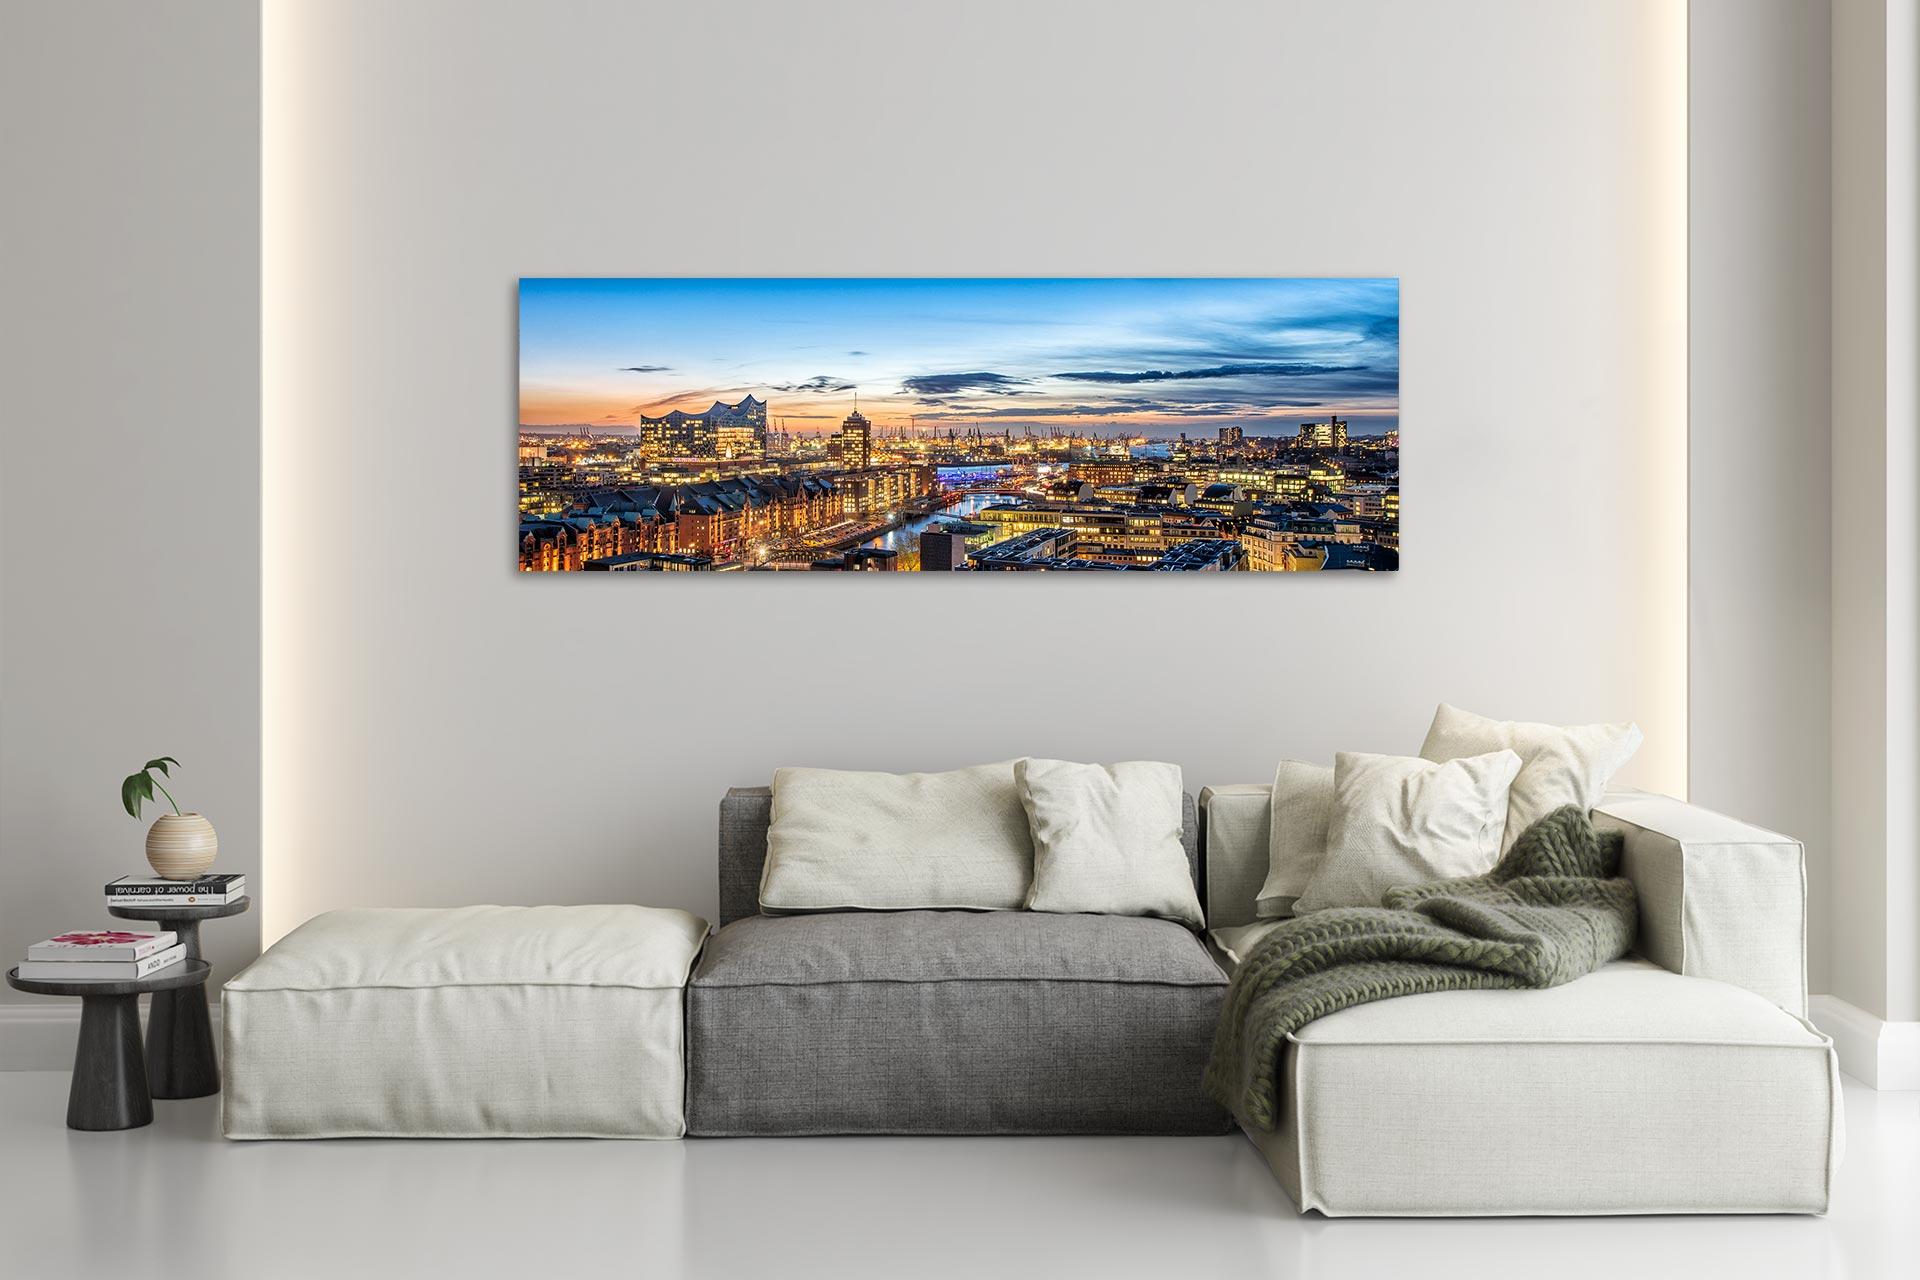 PSW105-panorama-elbphilharmonie-leinwand-acrylglas-aludibond-wohnzimmer